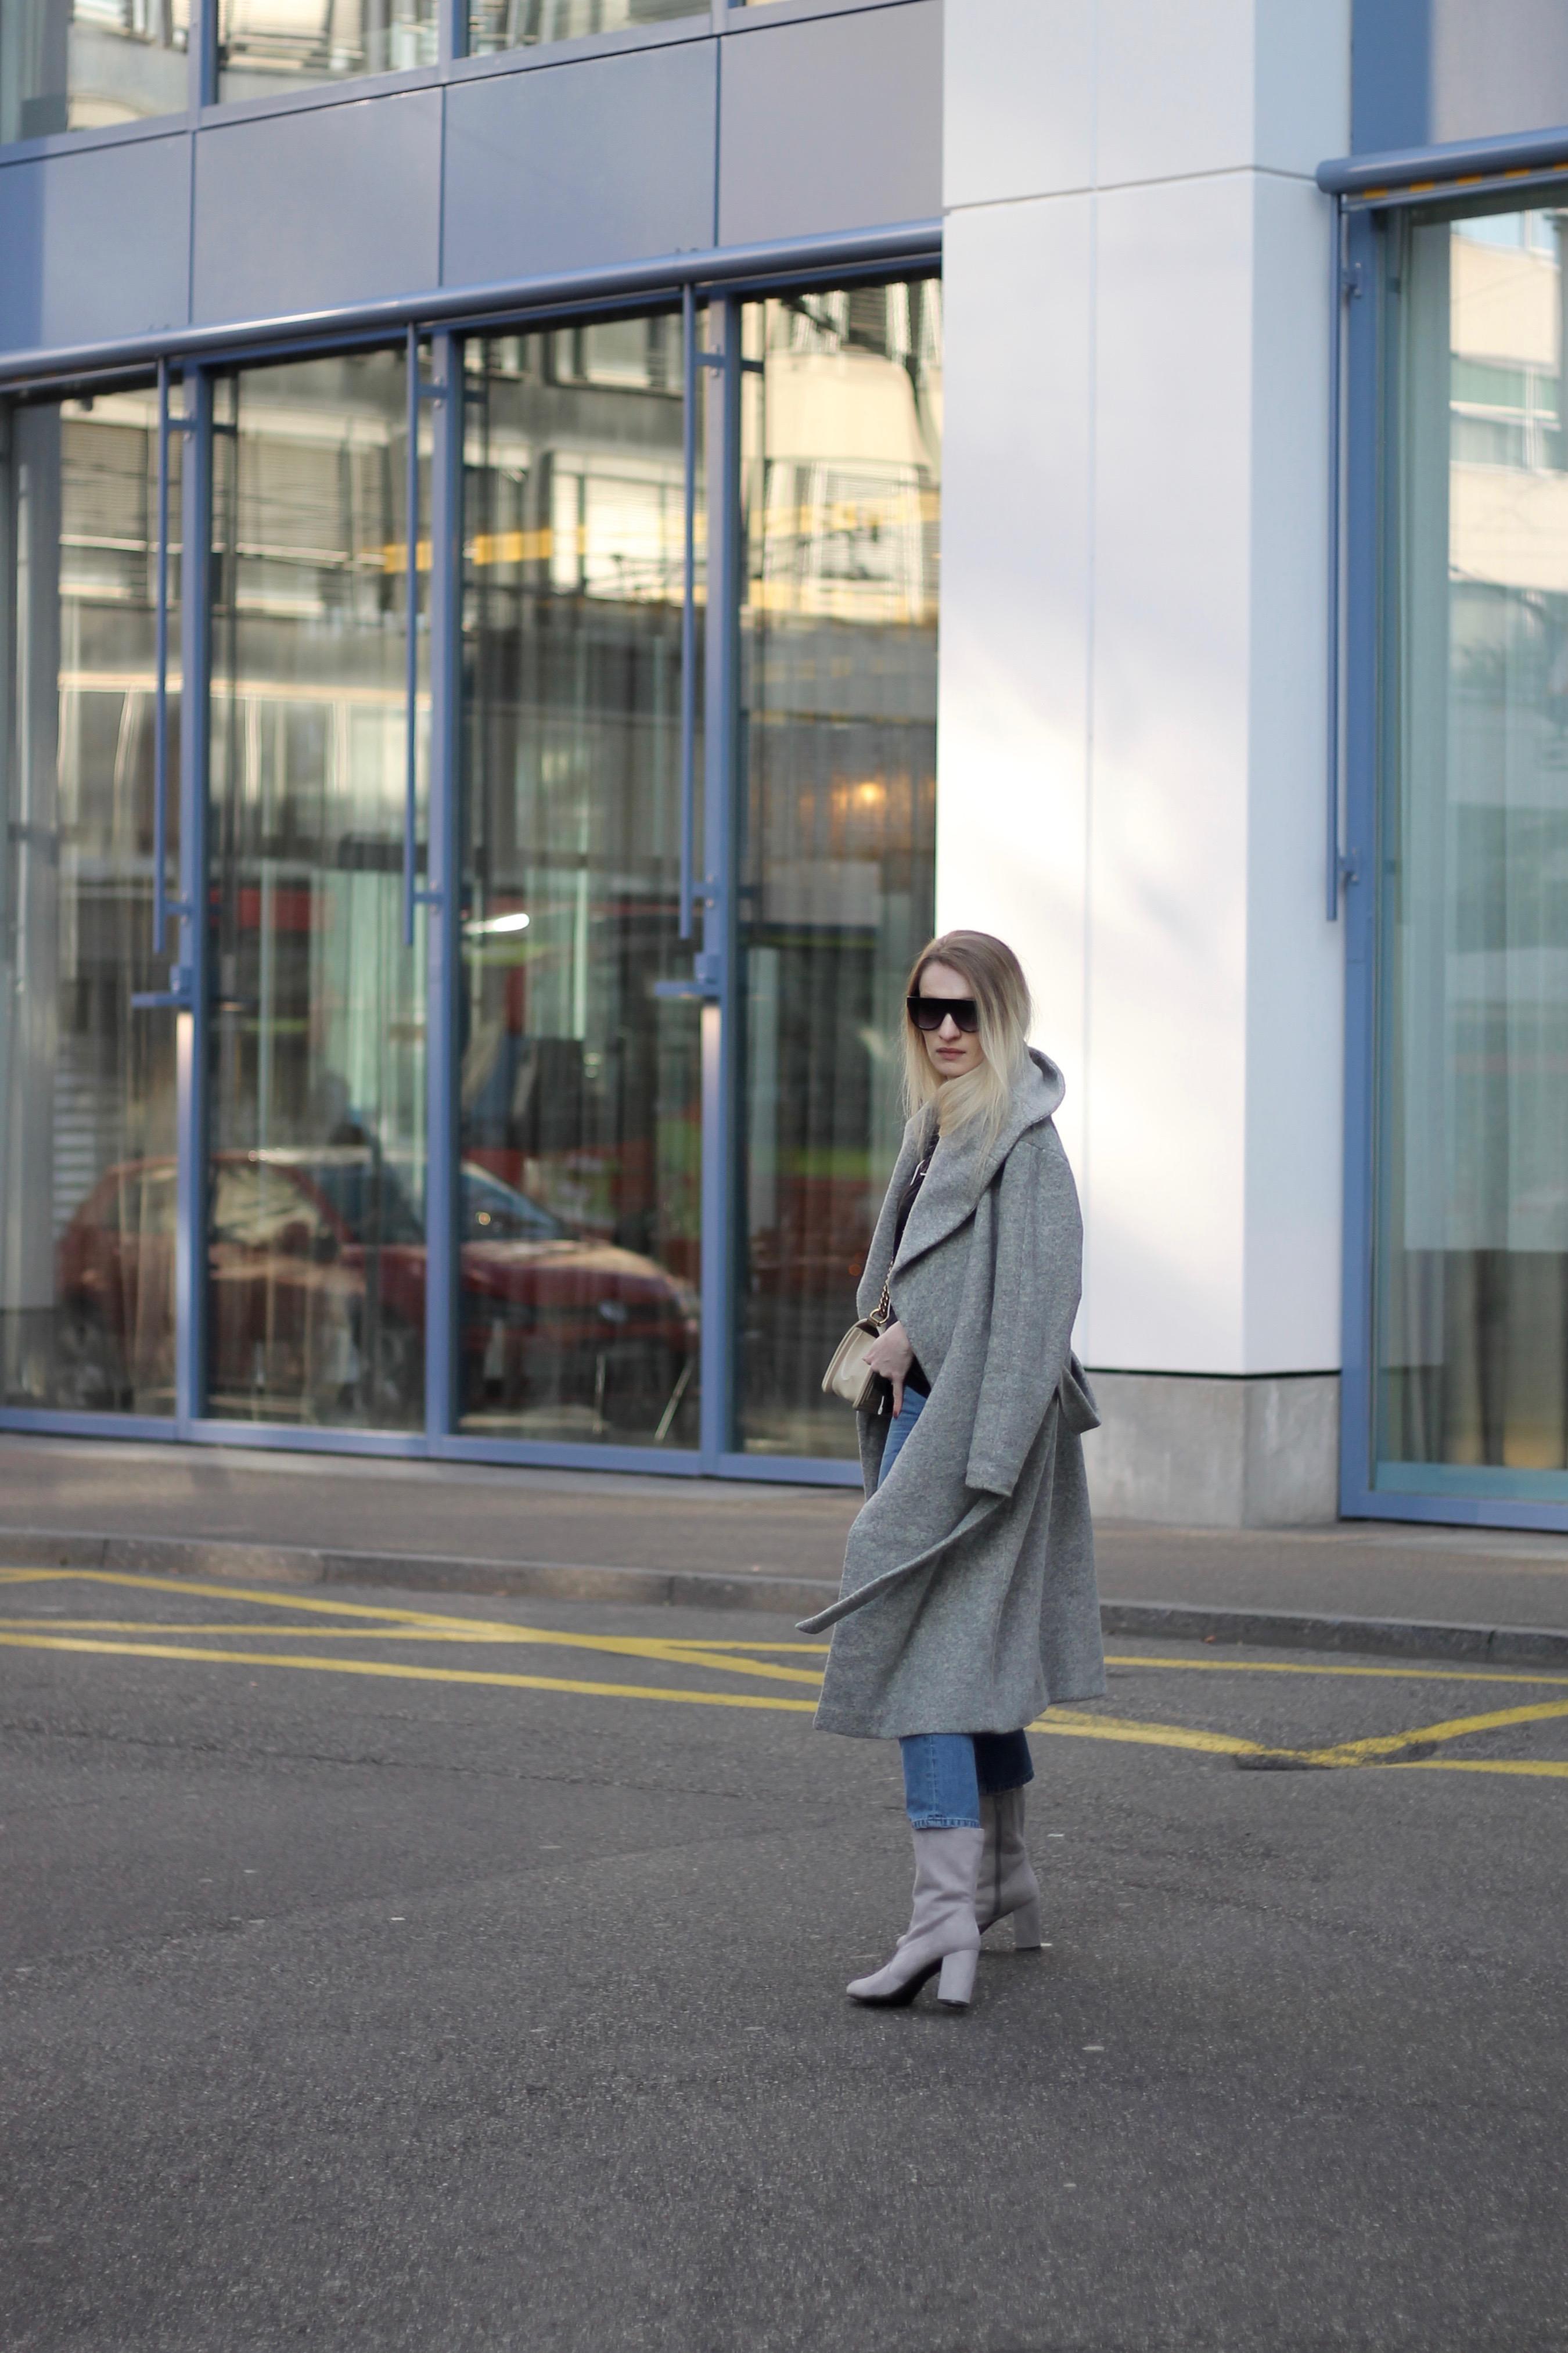 MON MODE   Fashion Blogger   Berlin Street Style   Fashion Trends   Berlin Fashion  PJ Bed Sheets   Chanel Boy